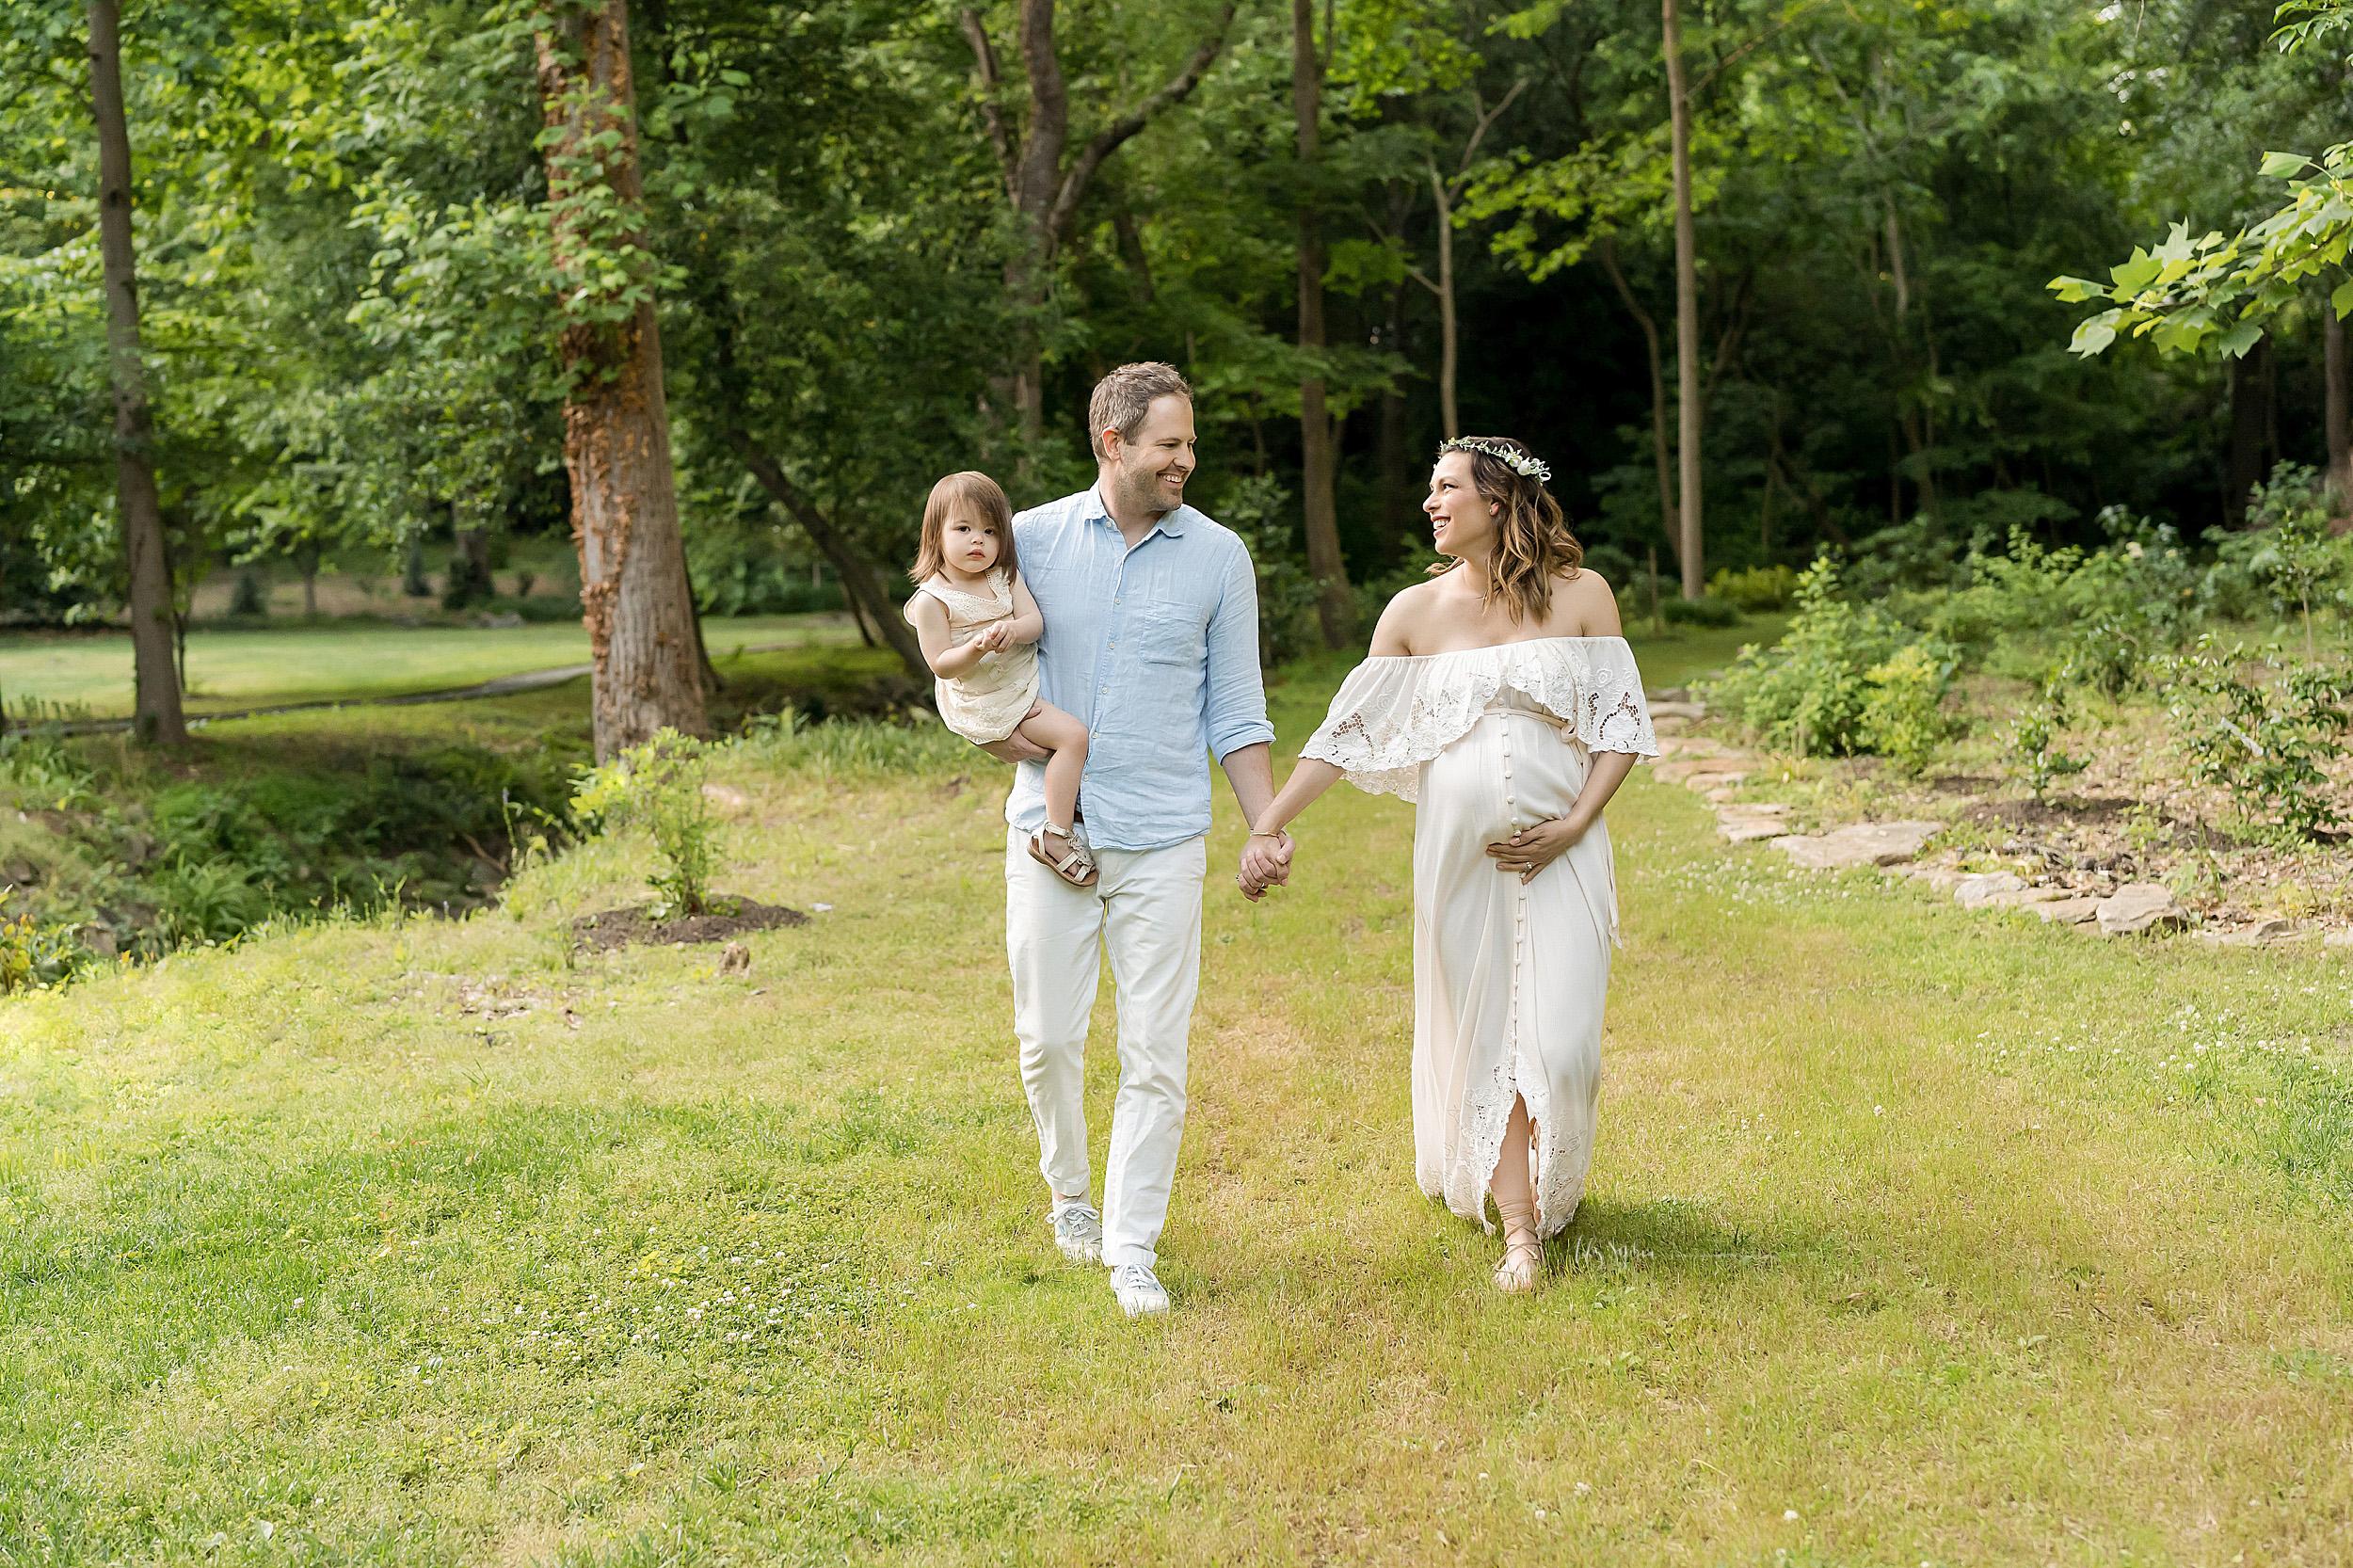 atlanta-decatur-acworth-candler-park-sandy-springs-buckhead-virginia-highlands-west-end-decatur-lily-sophia-photography-gardens-maternity-couples-family-photos-toddler-girl-expecting-newborn-baby-girl-sister_1701.jpg